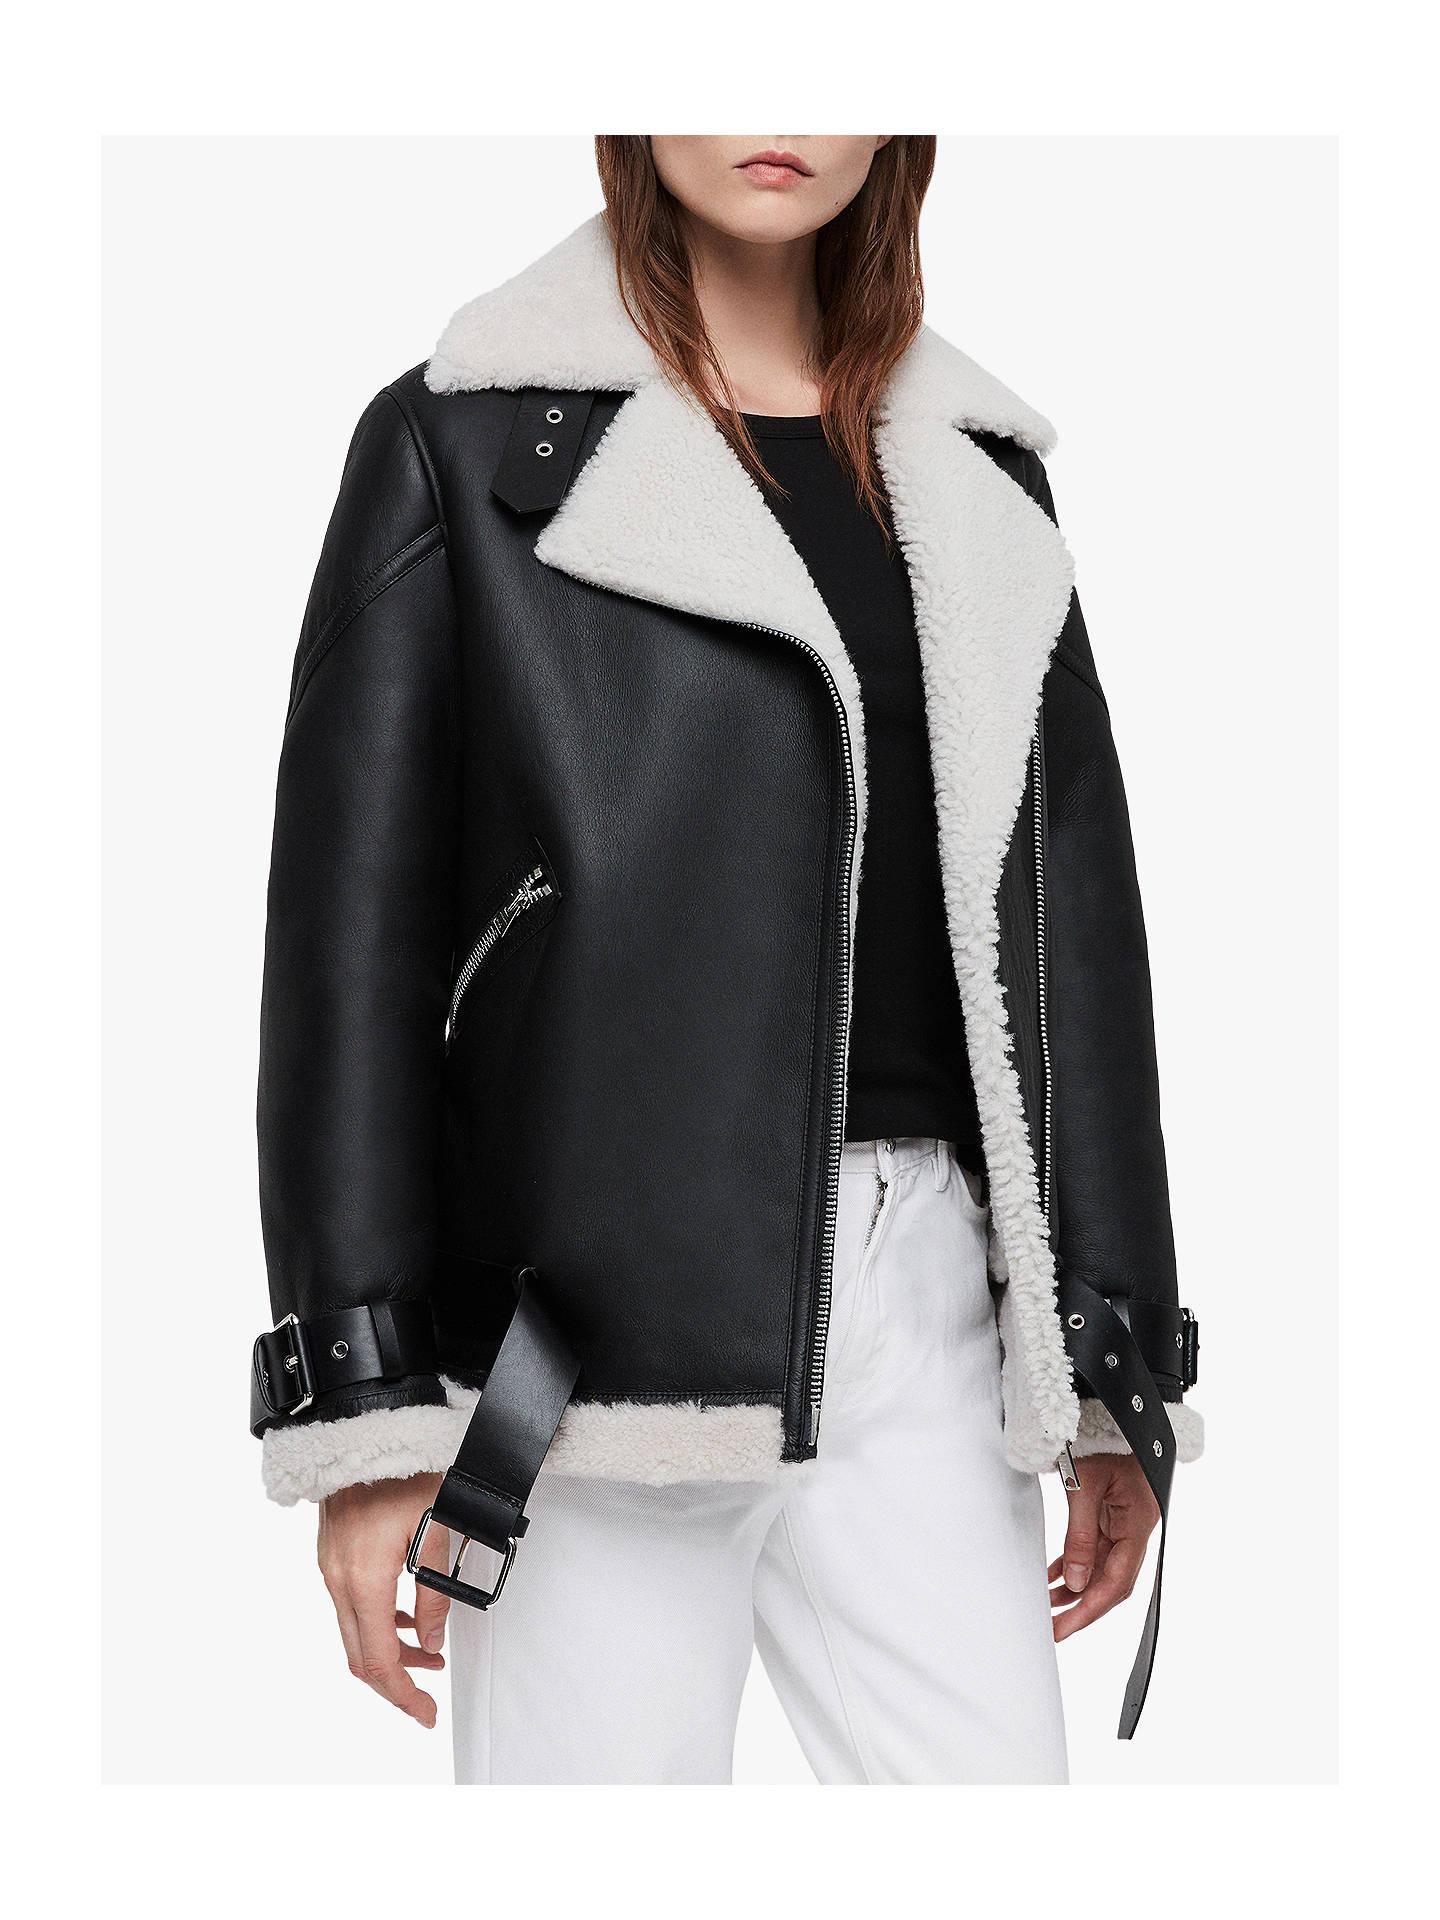 AllSaints Hawley Shearling Coat, Black at John Lewis & Partners